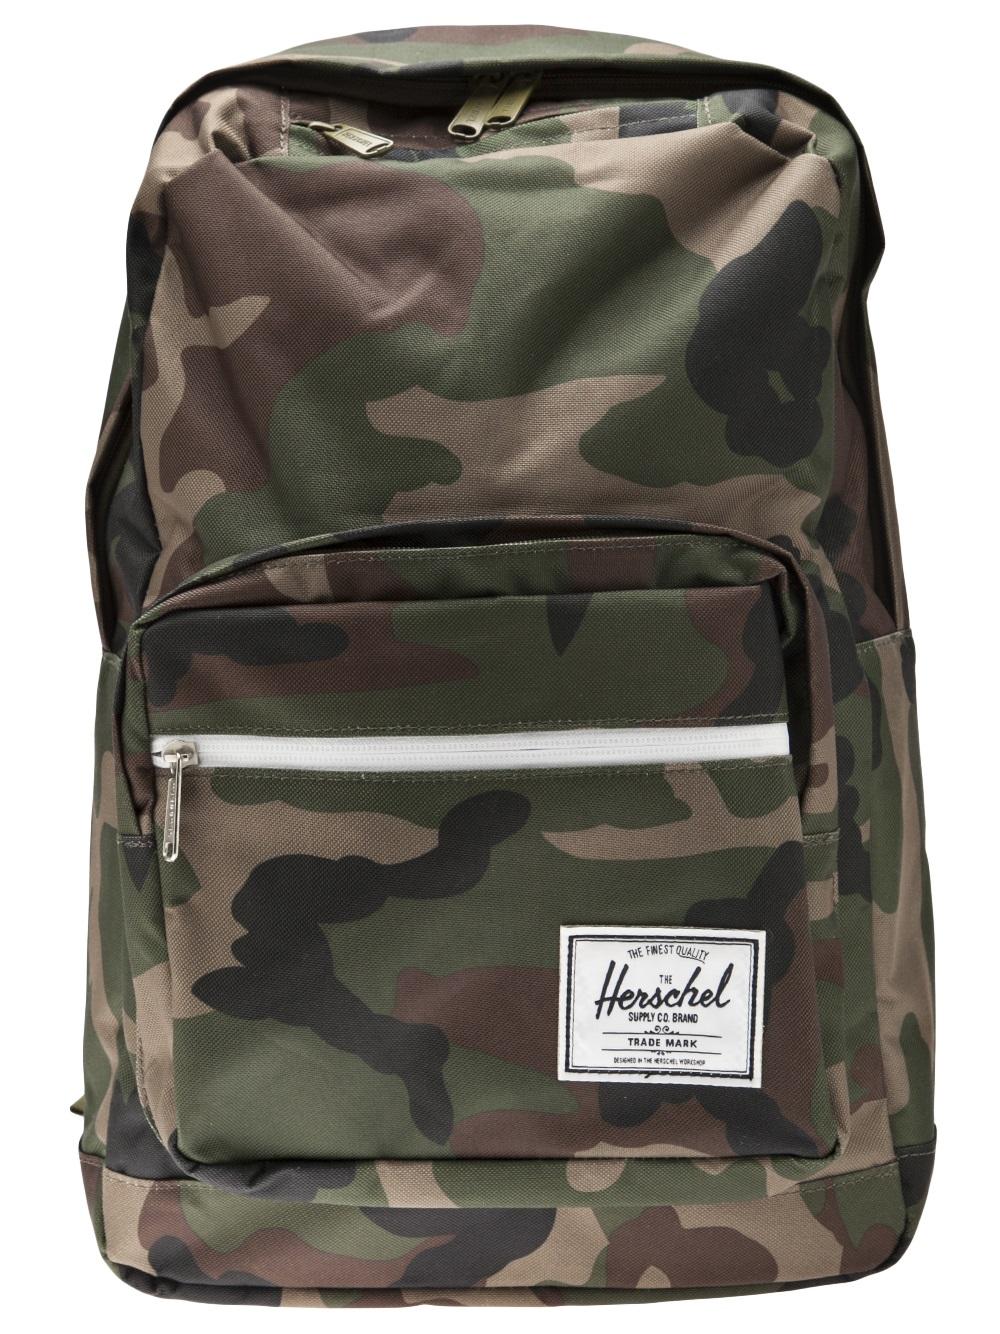 Lyst - Herschel Supply Co. Herschel Supply Co Pop Quiz Backpack in ... 2e8d6b22f289a